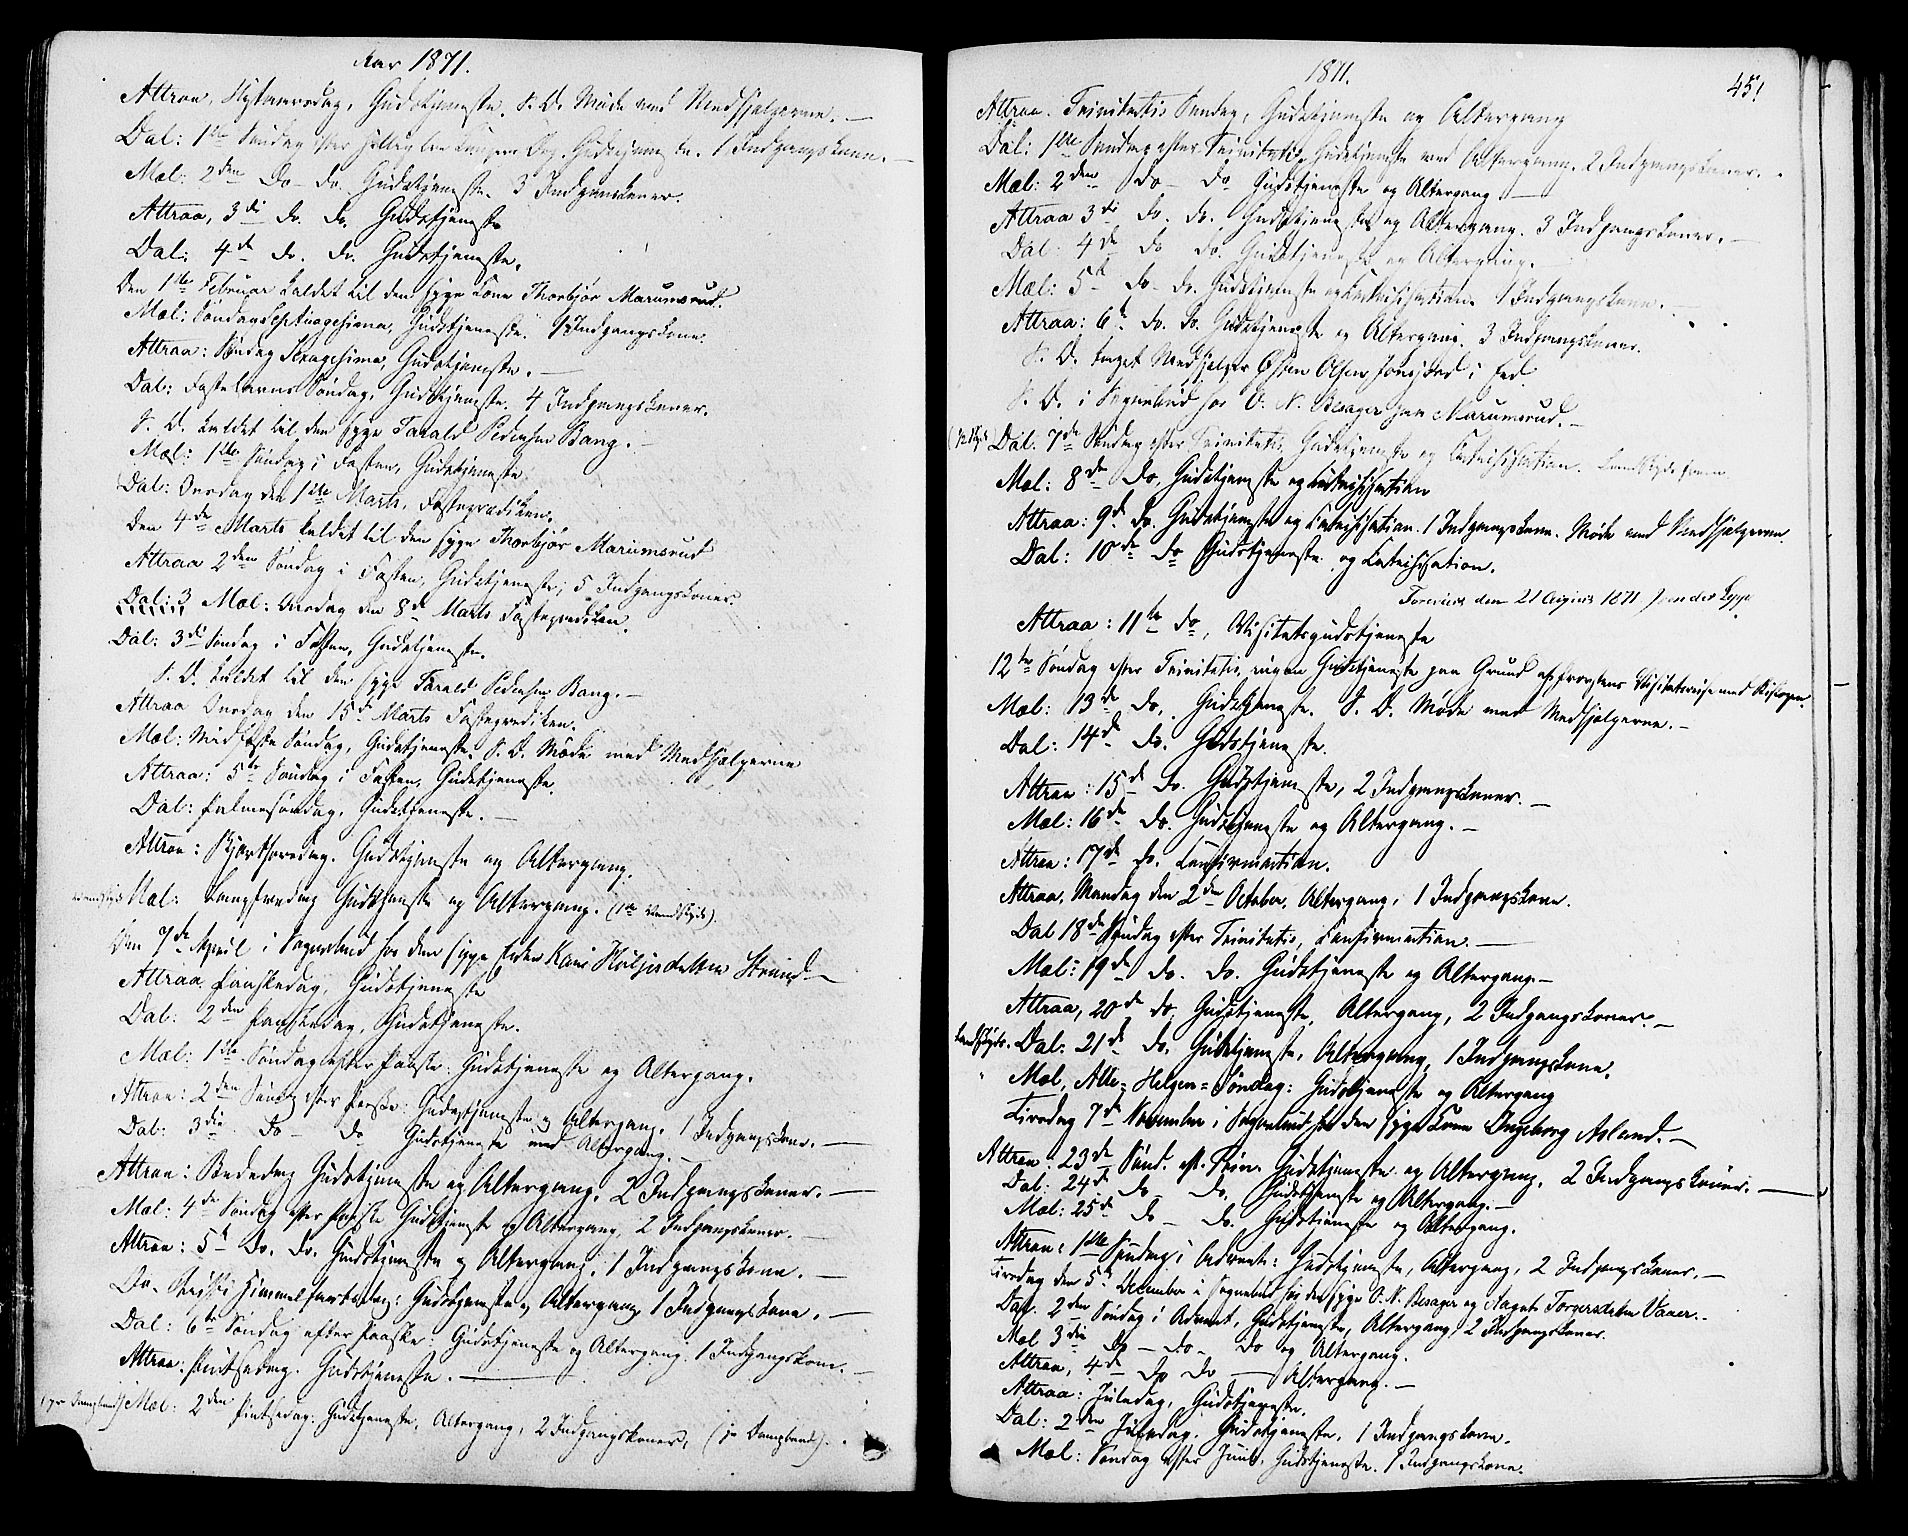 SAKO, Tinn kirkebøker, F/Fa/L0006: Ministerialbok nr. I 6, 1857-1878, s. 451